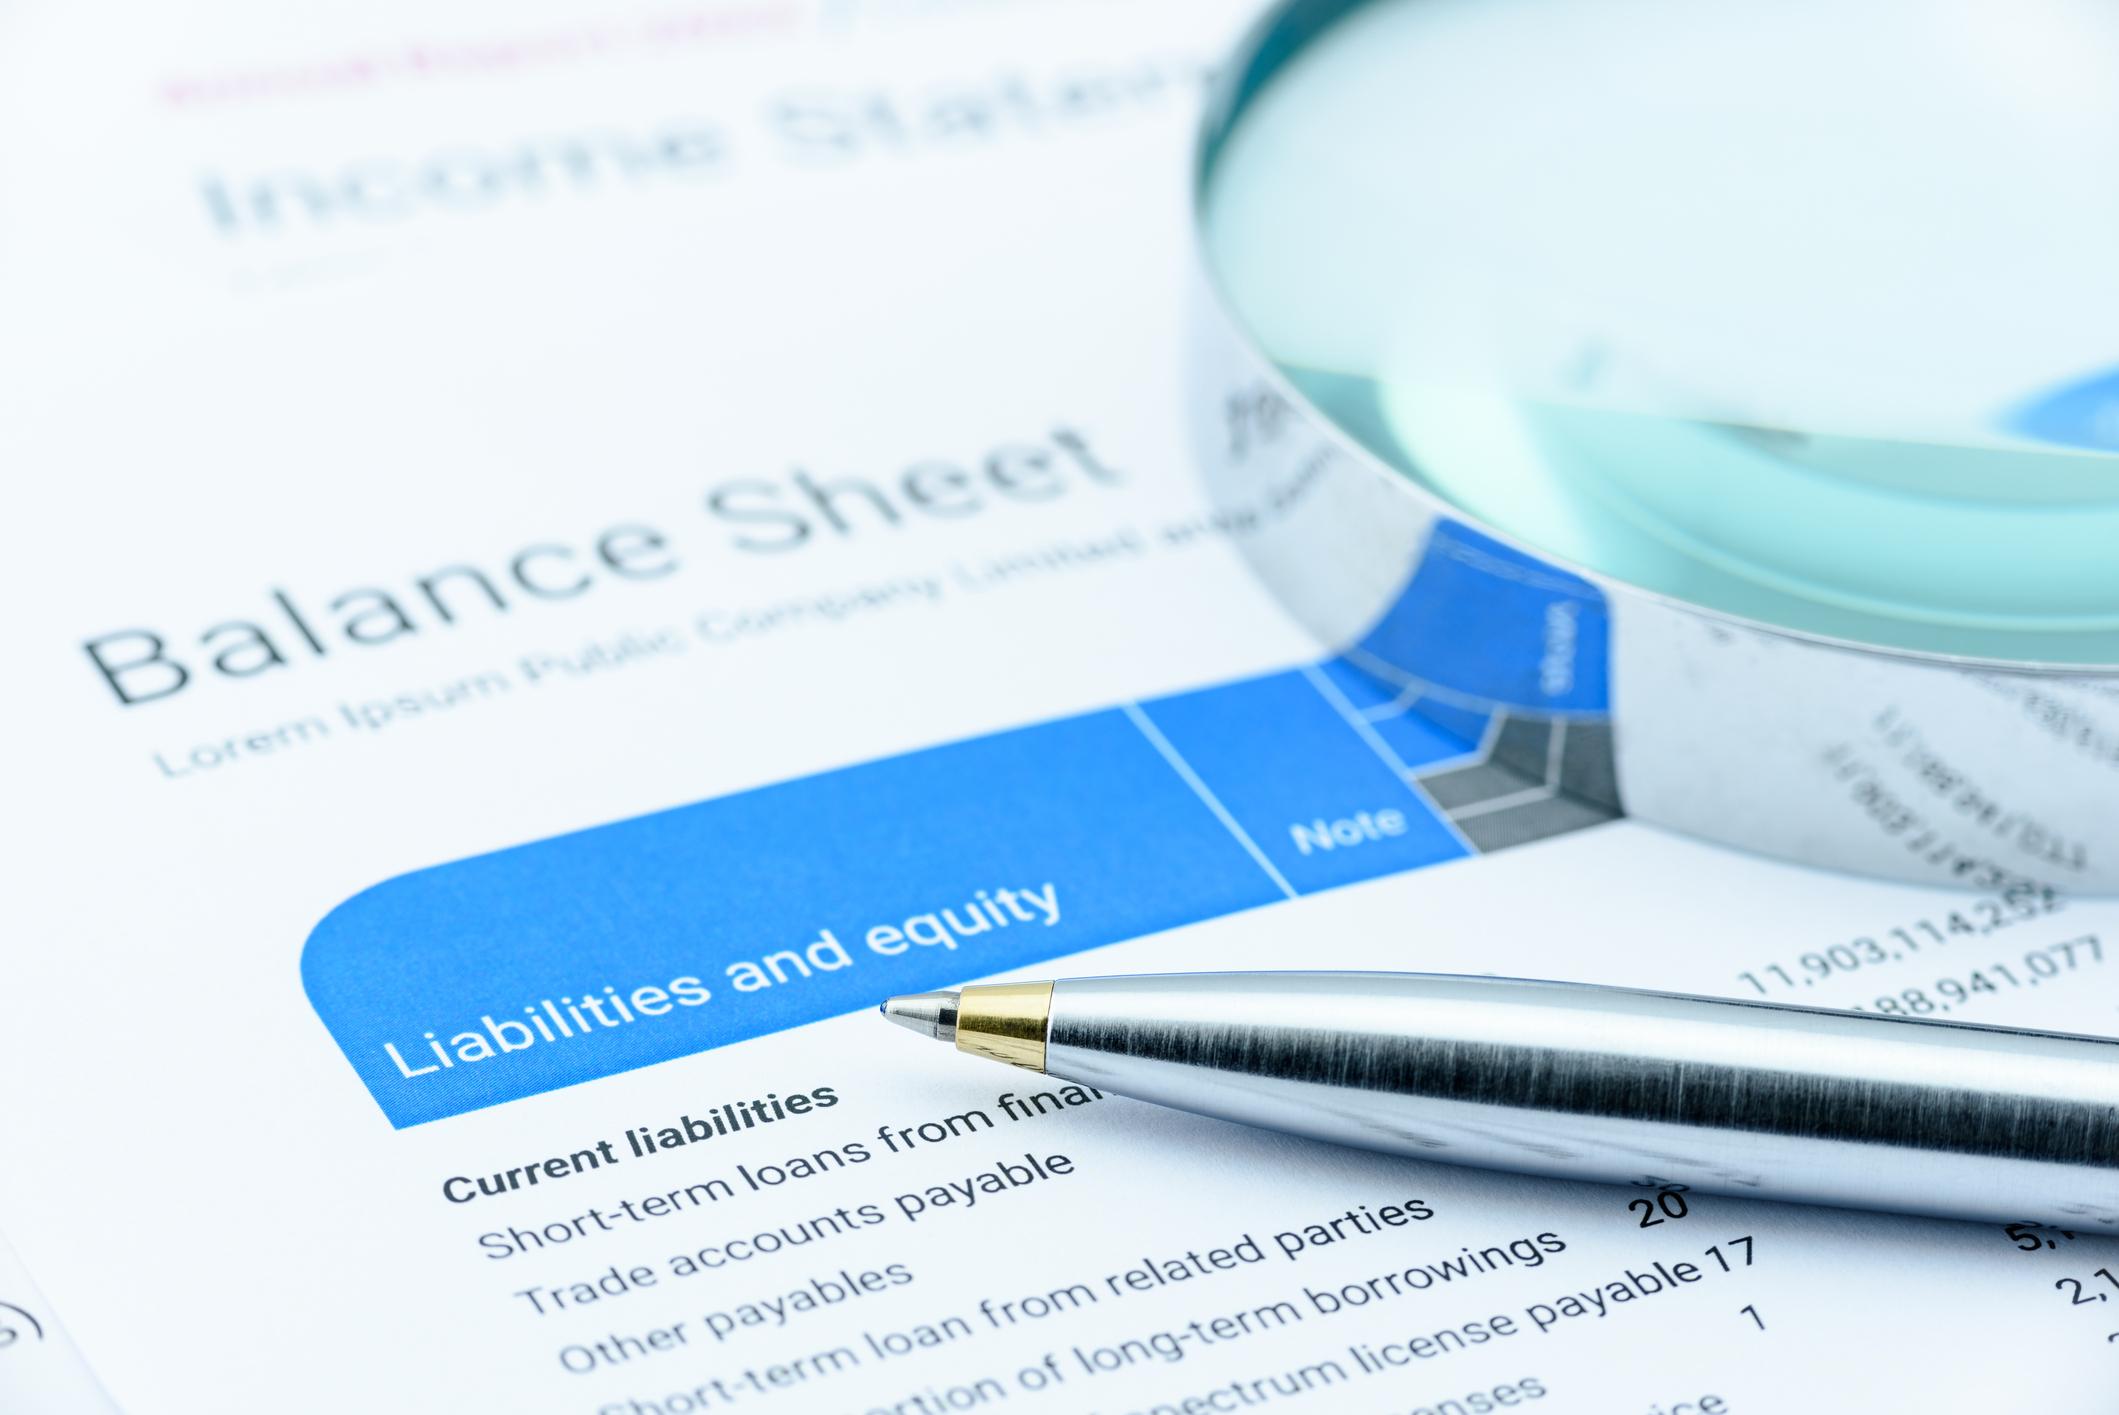 Pen and magnifying glass atop a balance sheet.